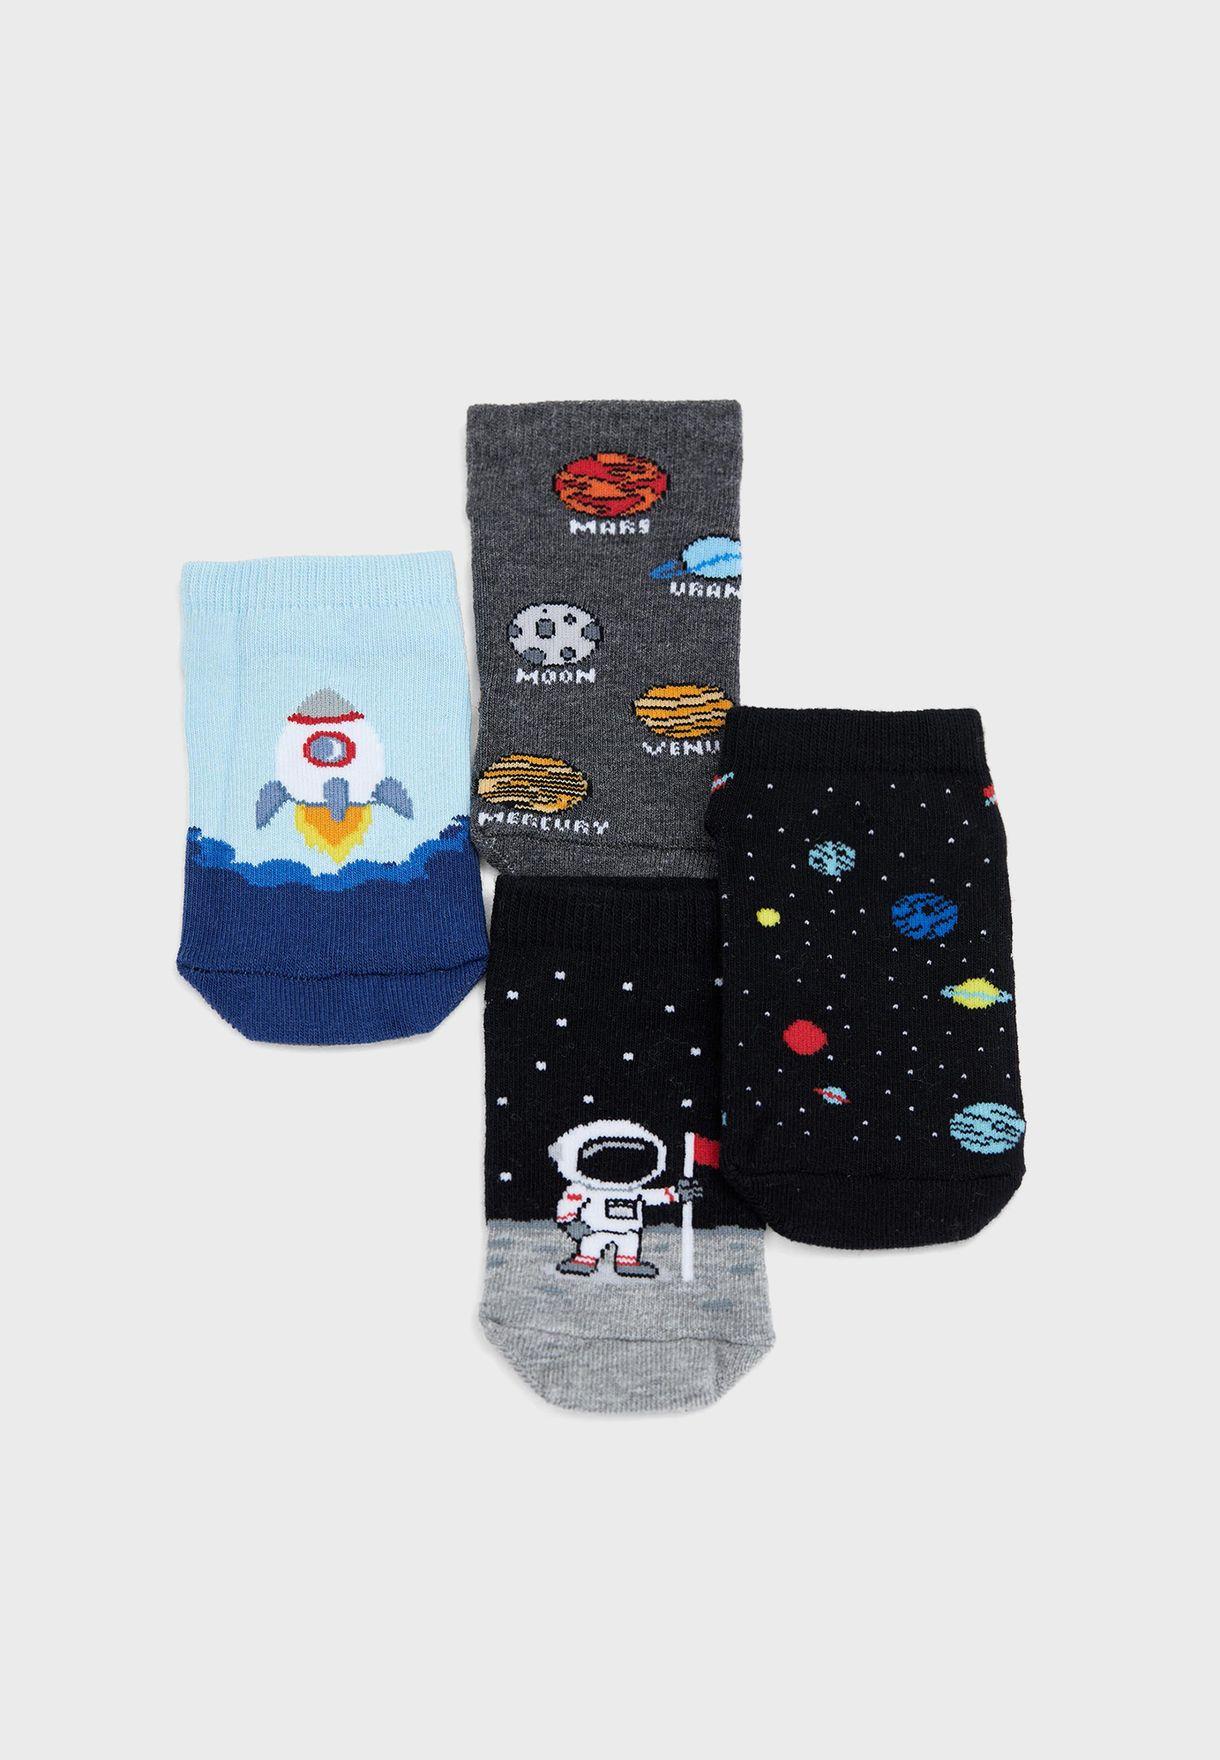 Kids 7 Pack Assorted Socks